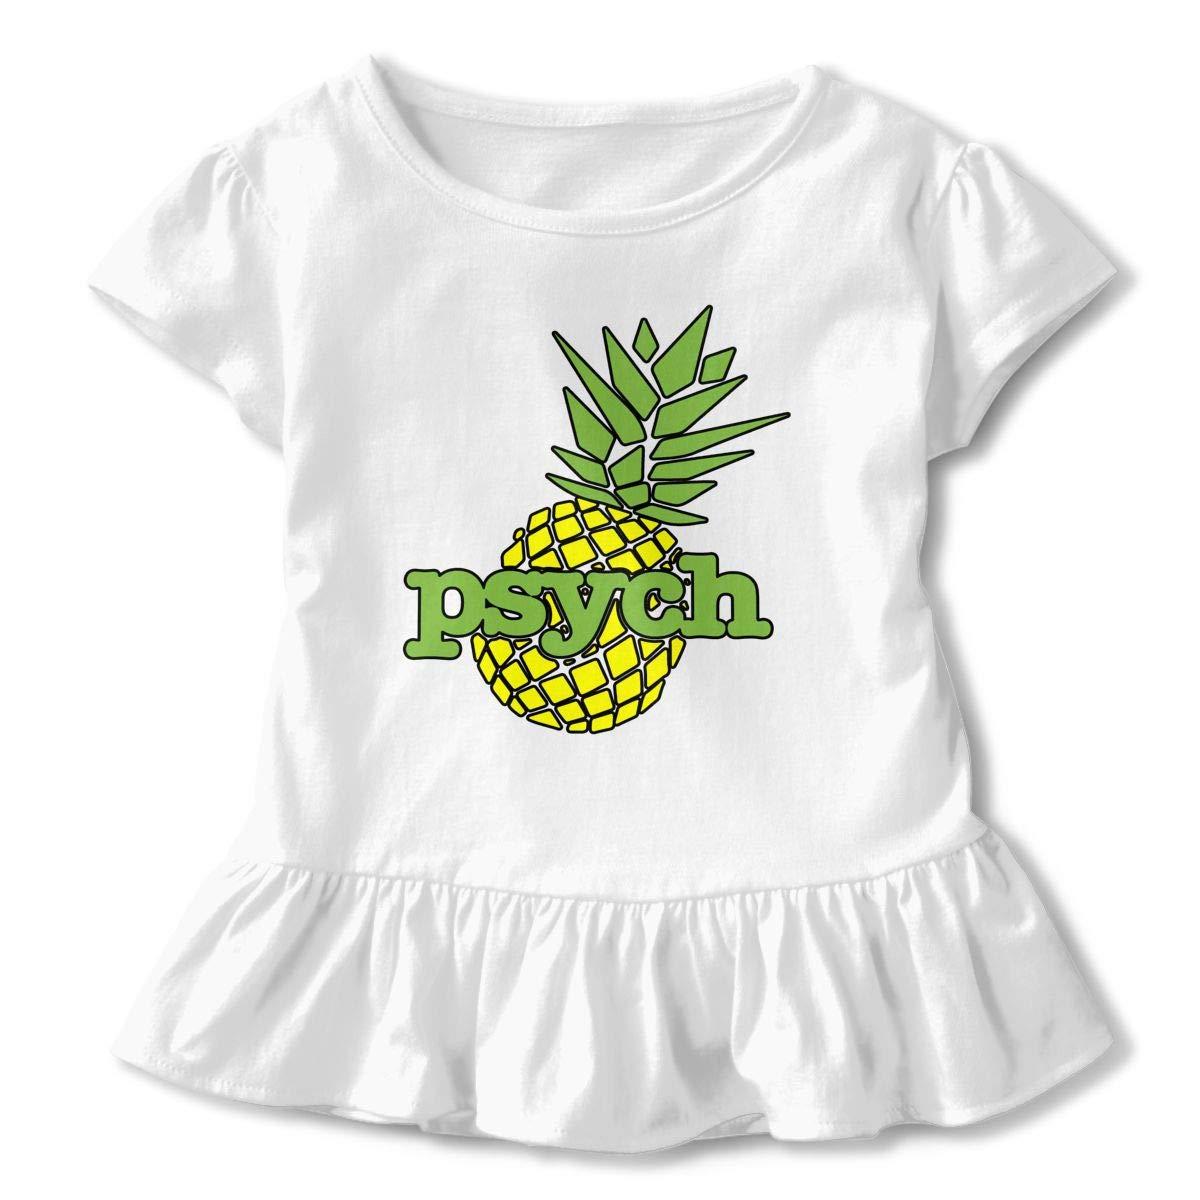 Psych Pineapple Toddler Baby Girls Cotton Ruffle Short Sleeve Top Basic T-Shirt 2-6T